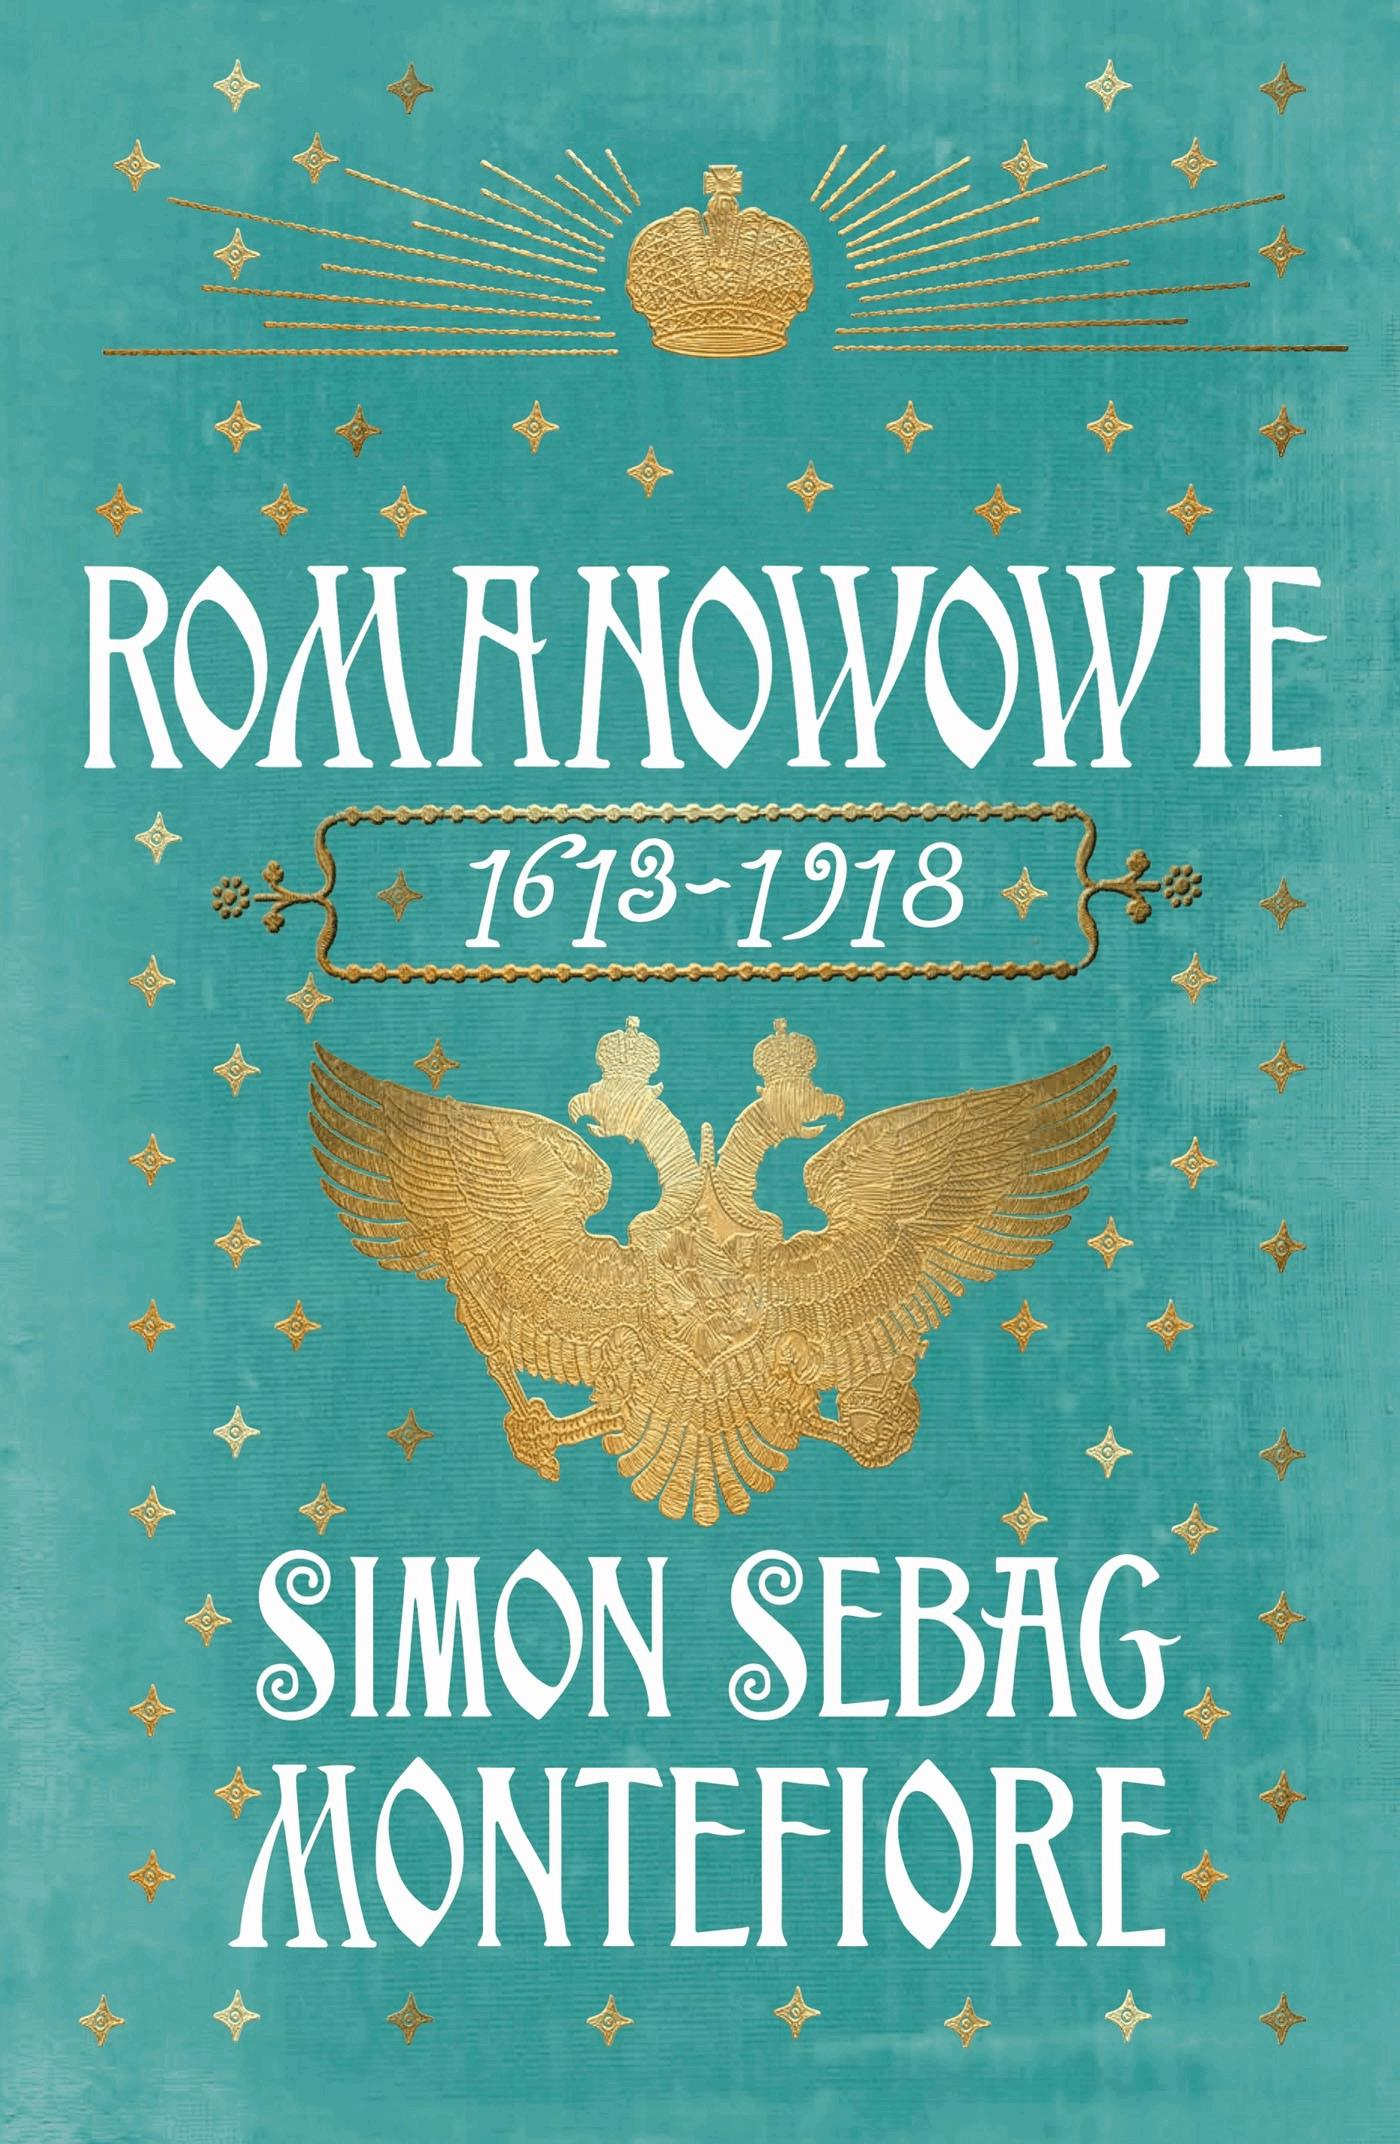 Romanowowie 1613-1918 - Simon Sebag Montefiore